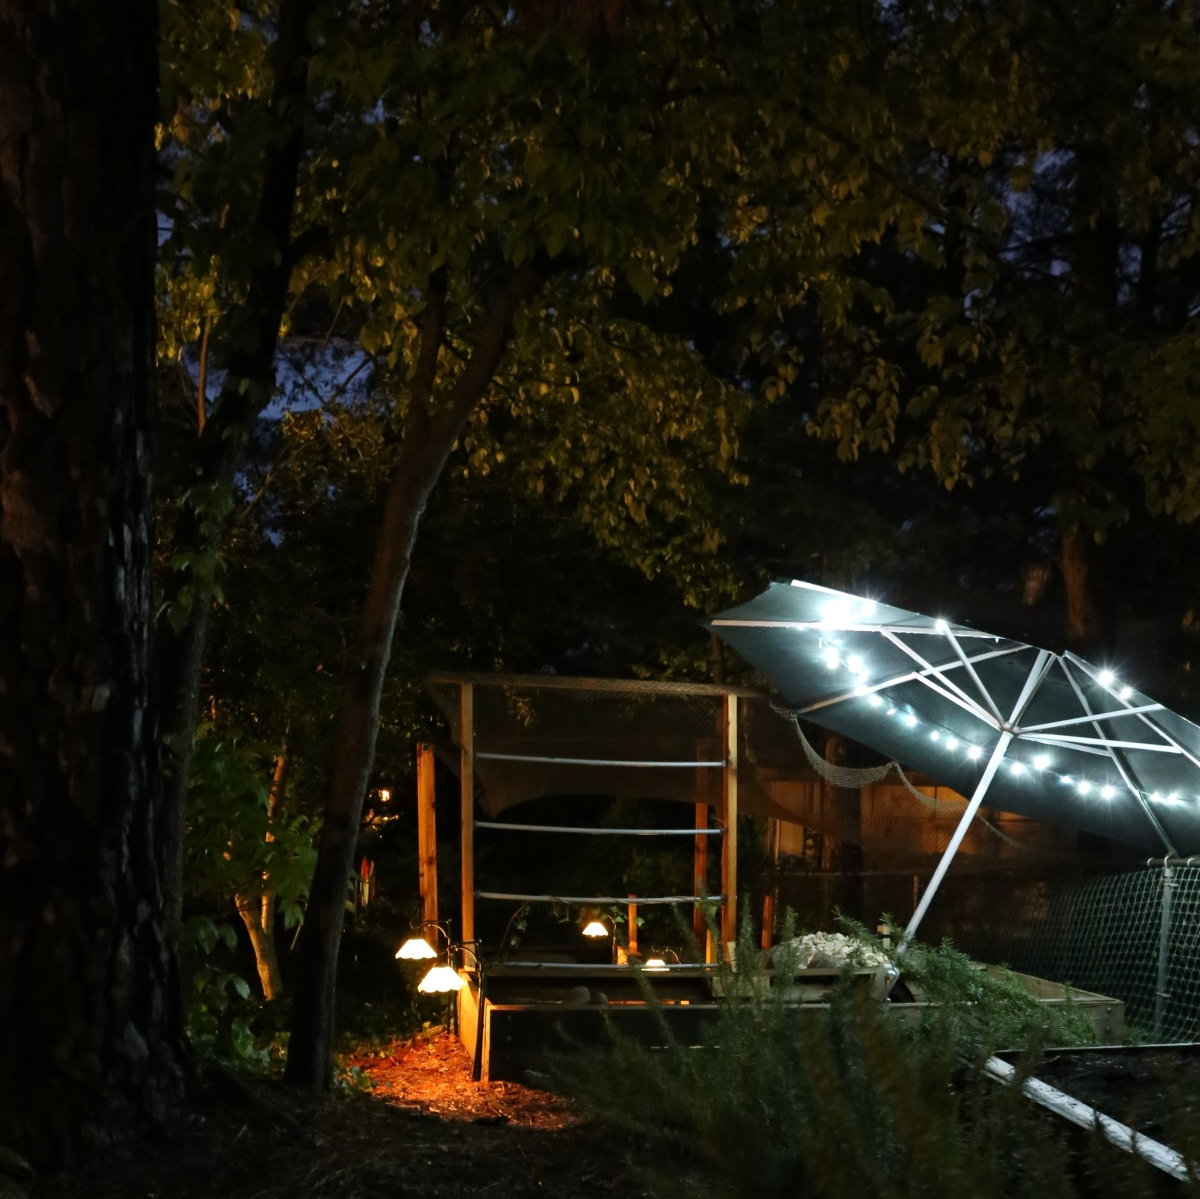 Photography ~ Outdoor Aquatic Habitat–After Dark [Top],04/22